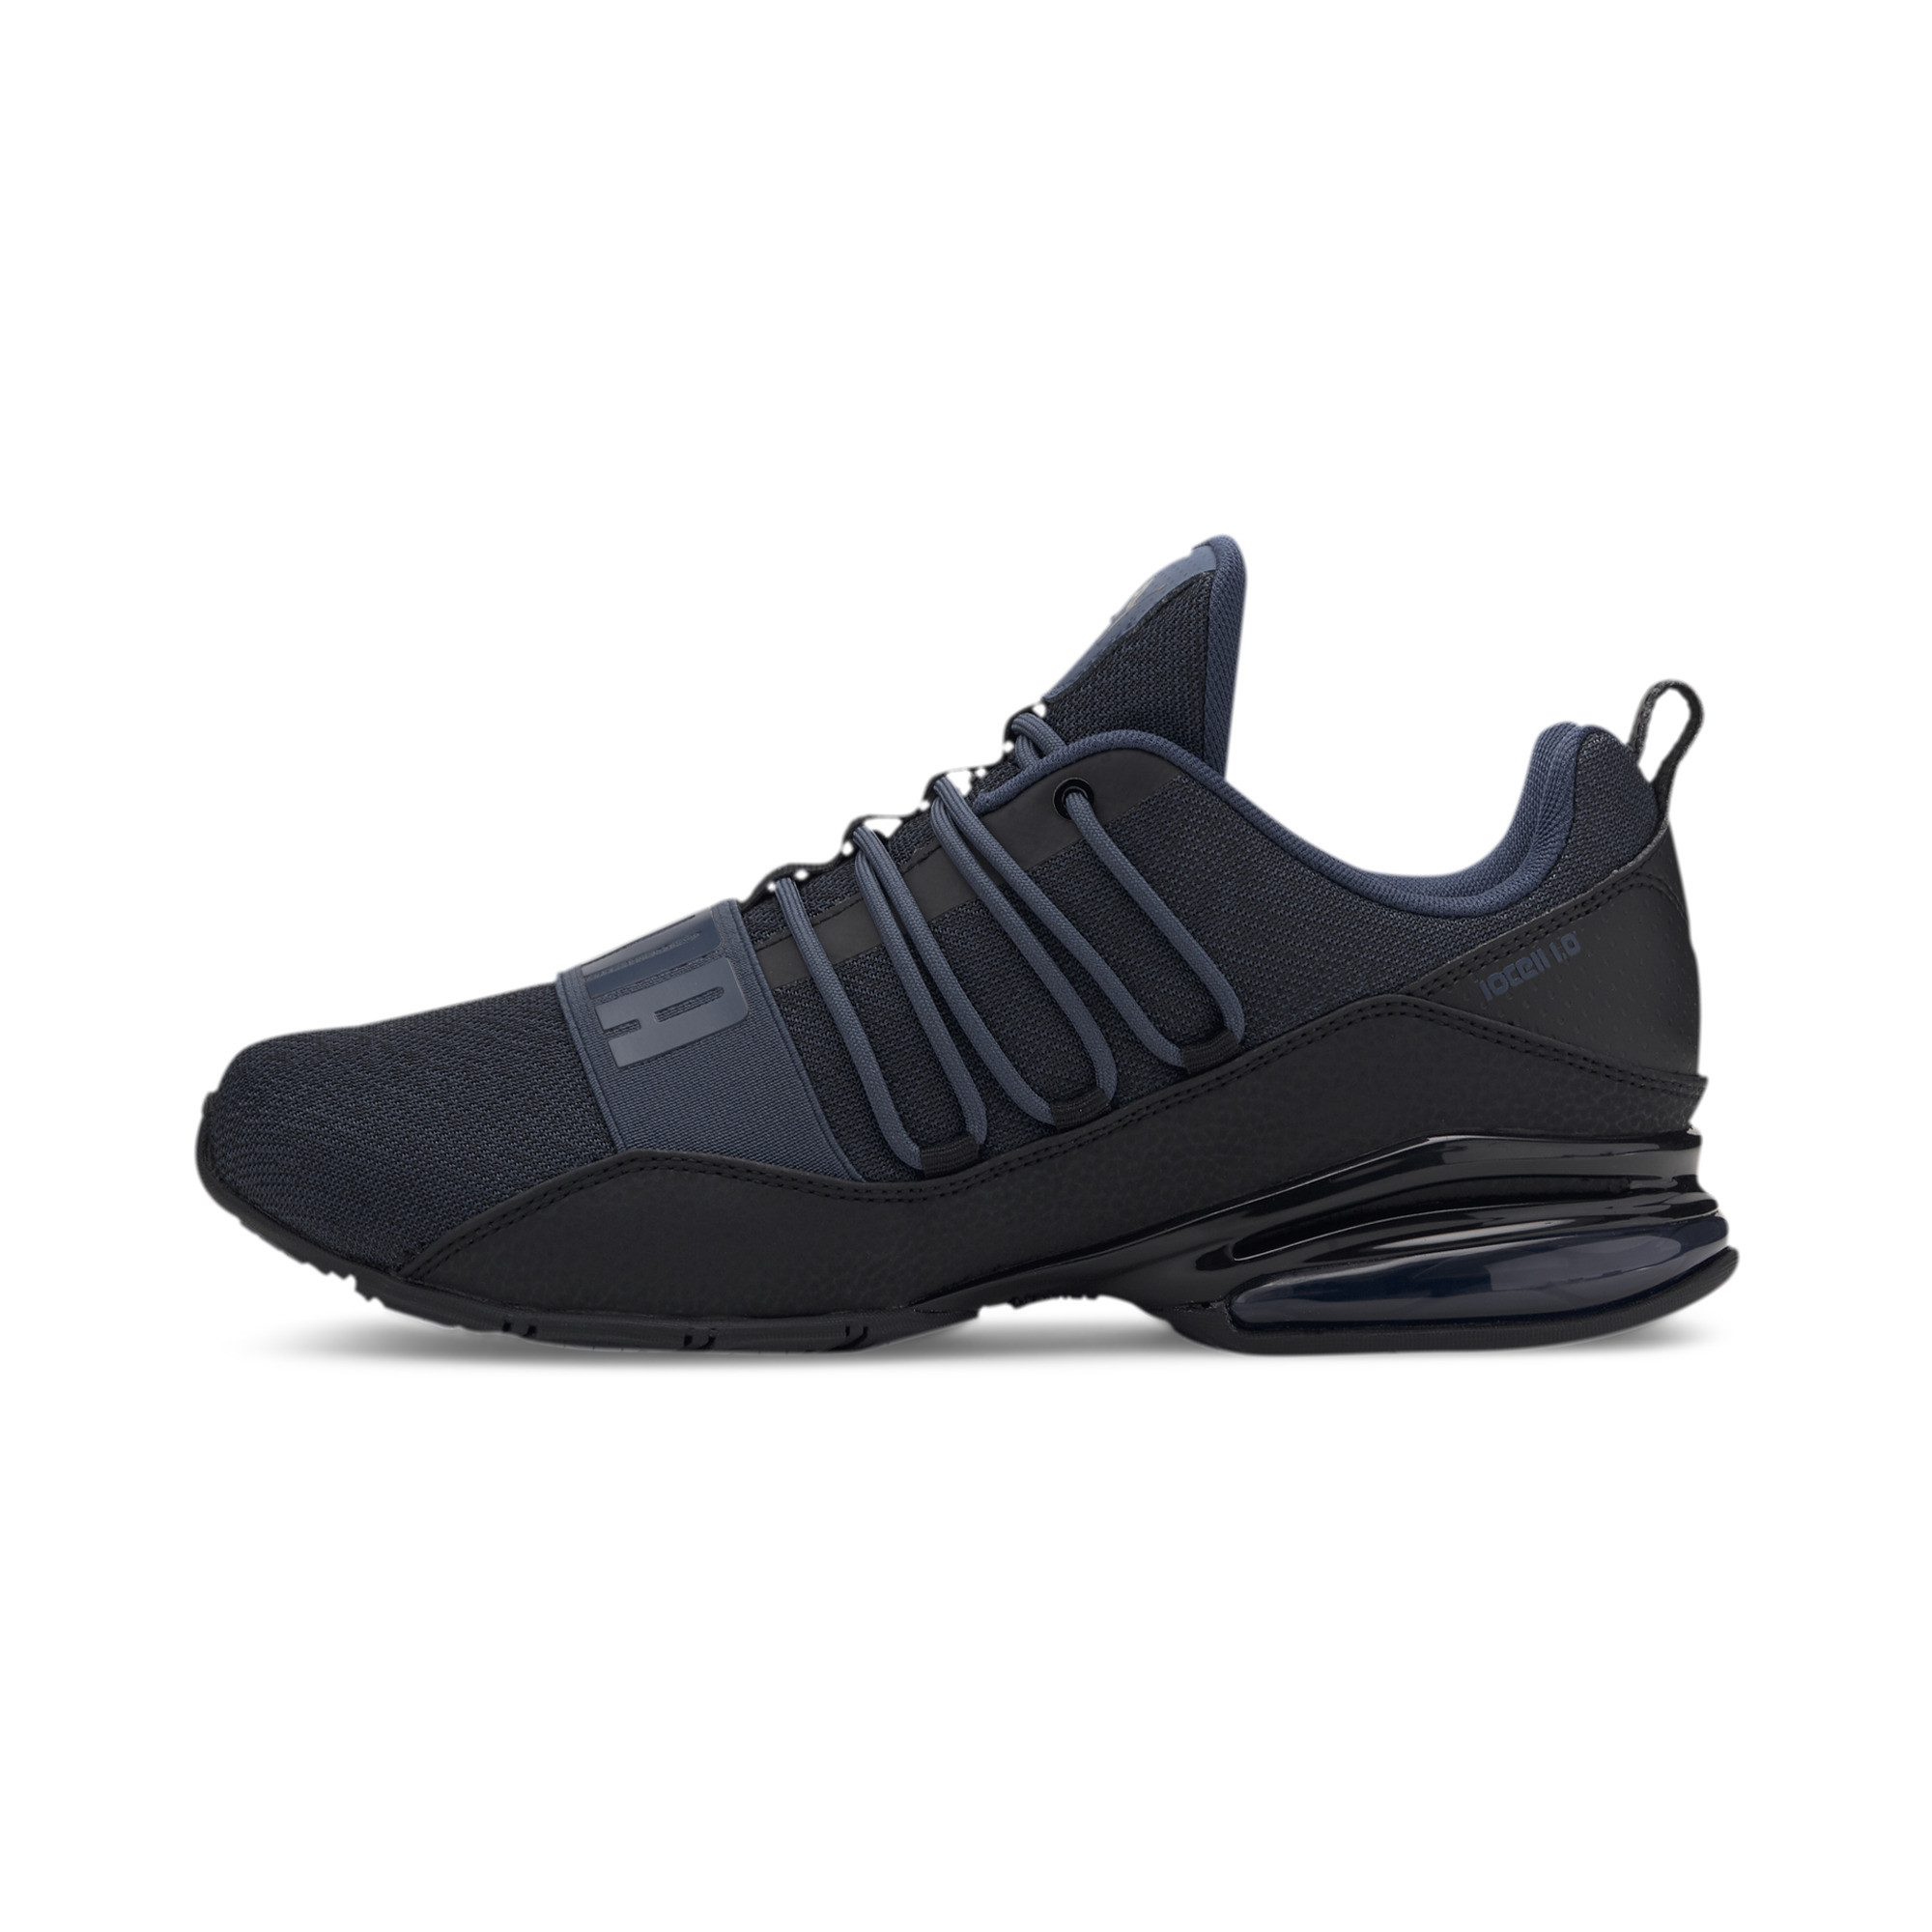 PUMA-Men-039-s-CELL-Regulate-Bold-Training-Shoes thumbnail 4